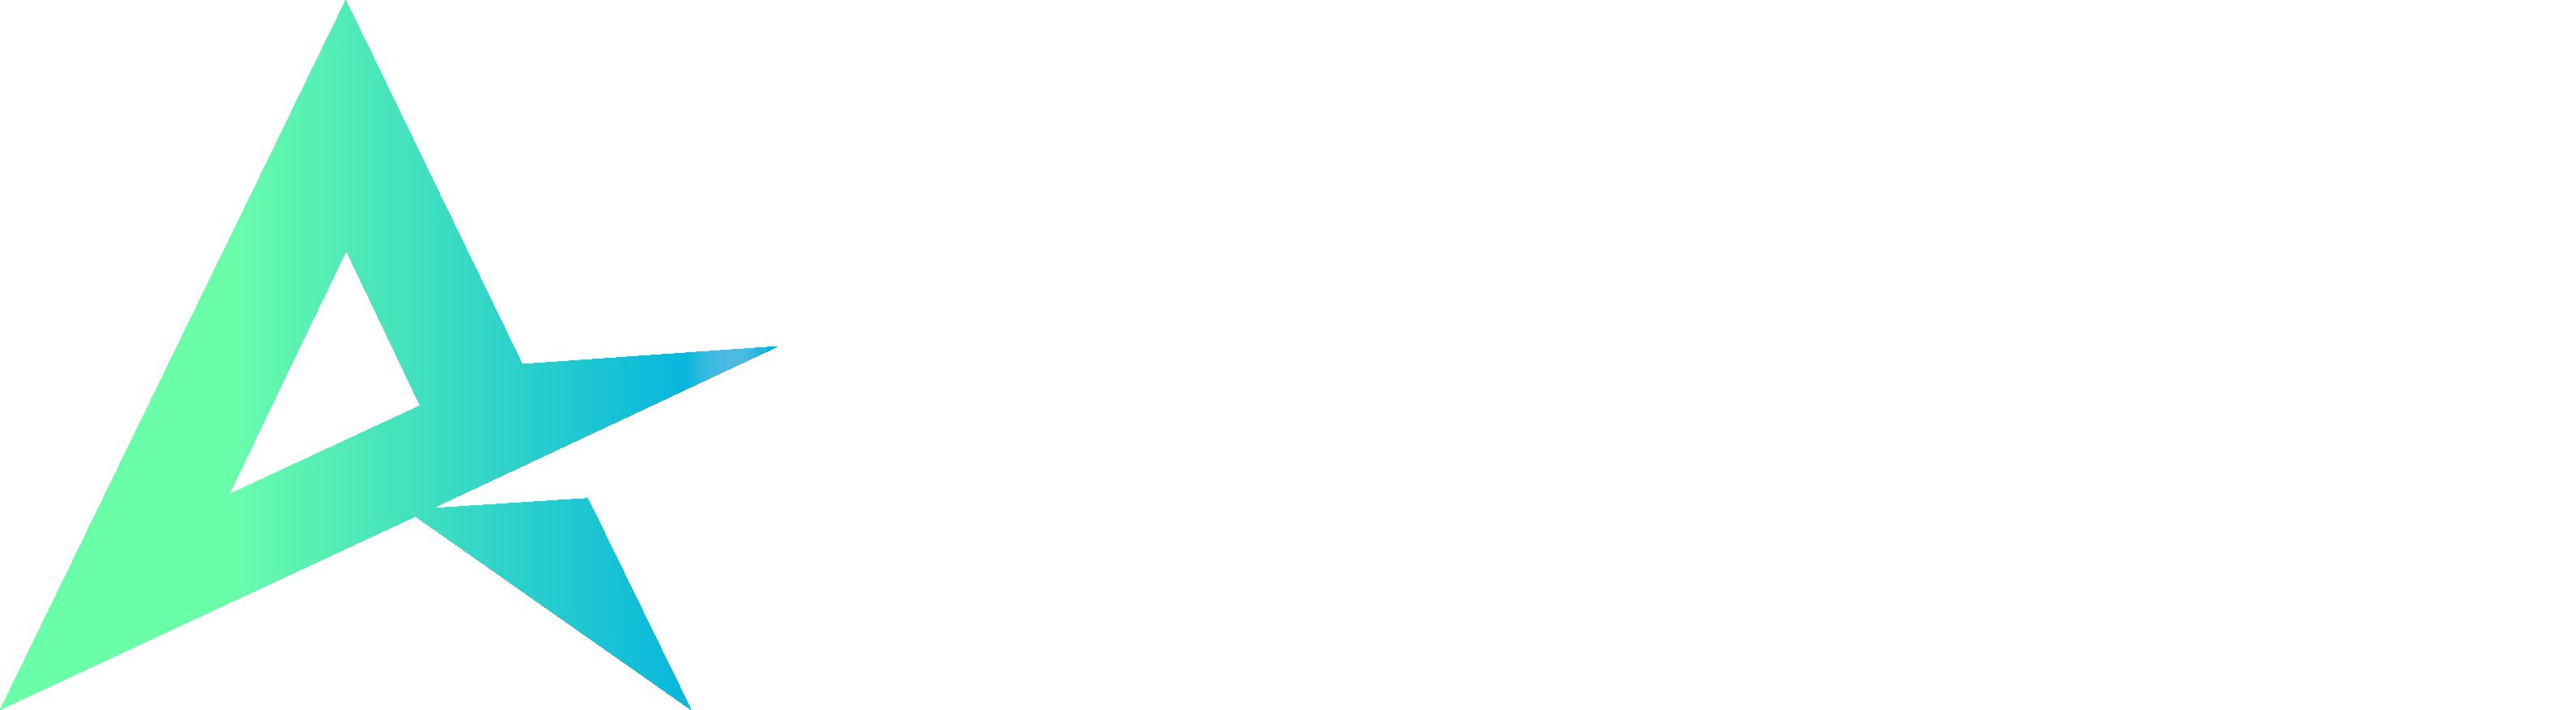 Alpha_Horizontal_NoBorder_Gradient-01